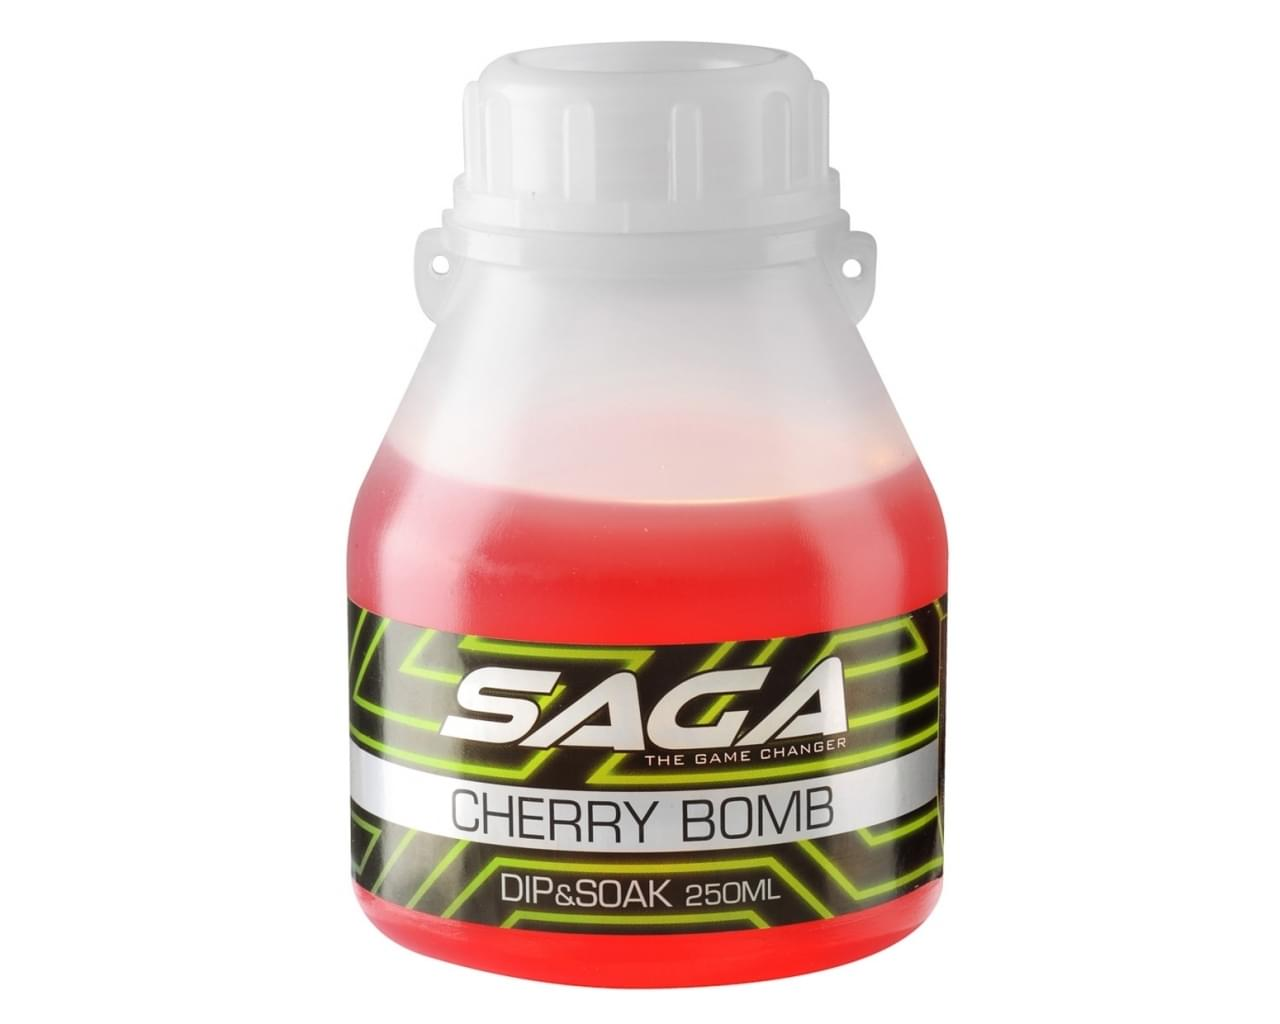 Strategy Saga Premium Dip & Soak